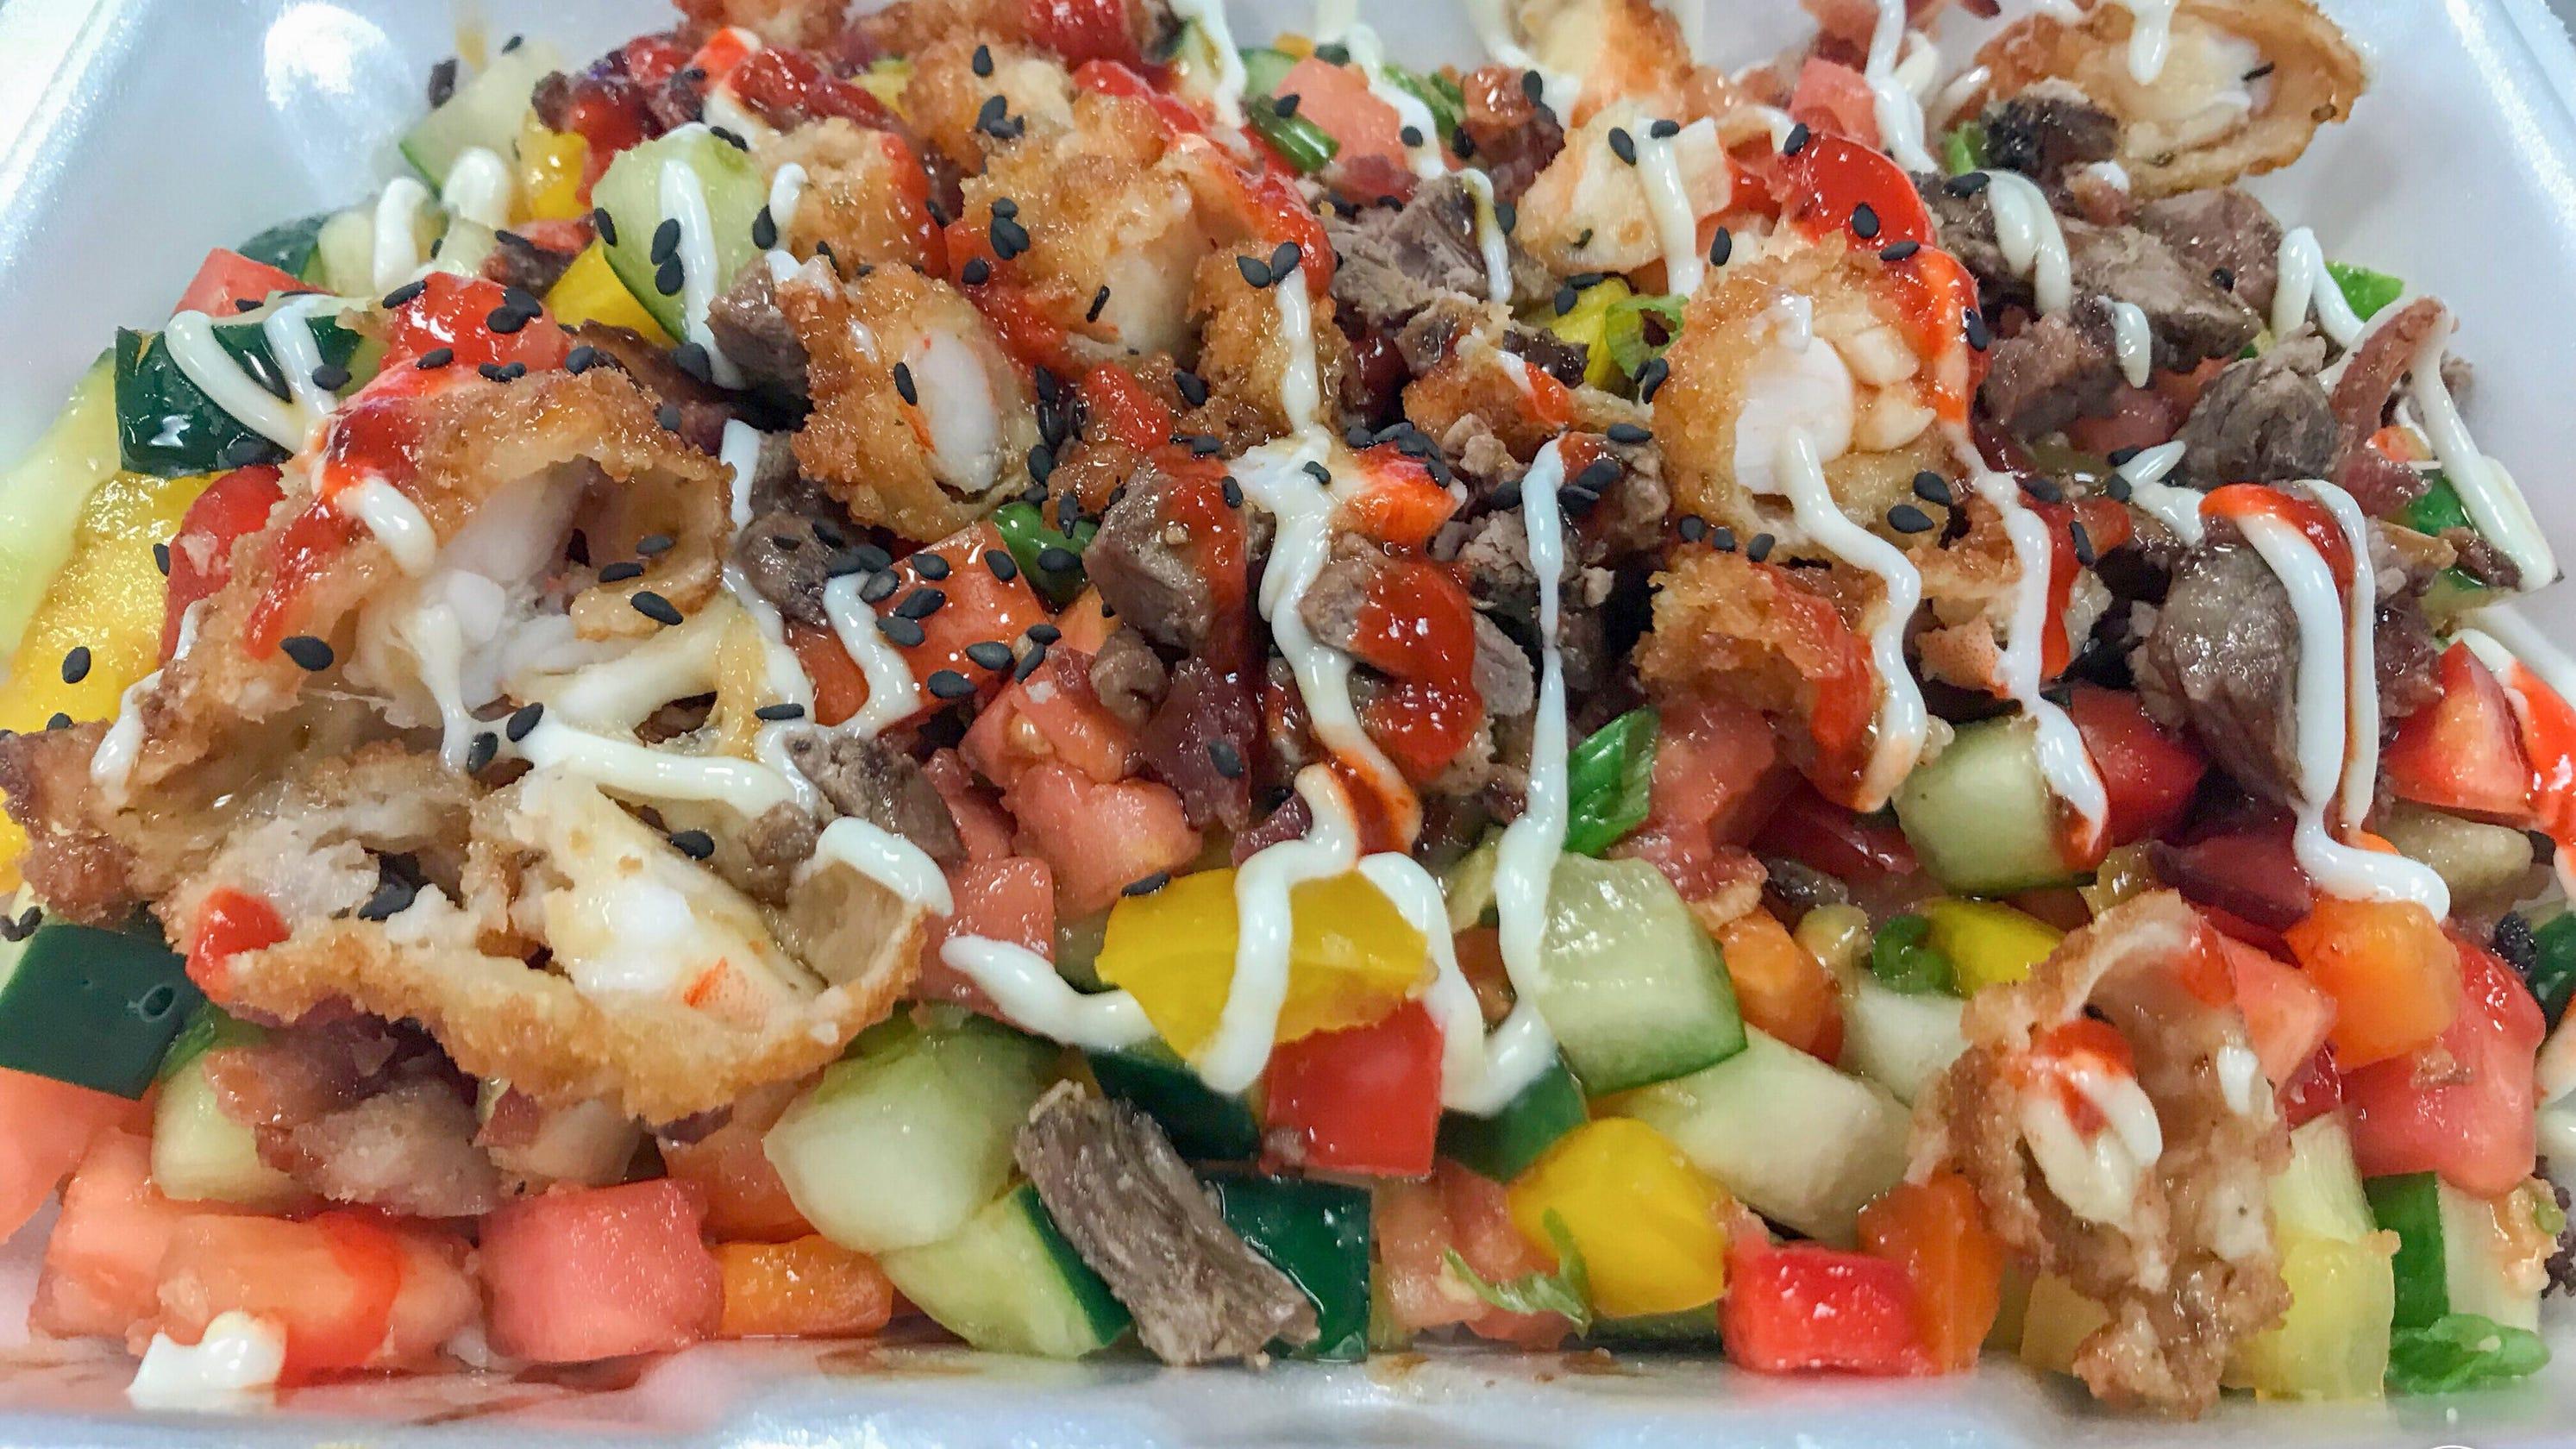 Stingray Sushifusion Food Truck Opens Kocina Restaurant In